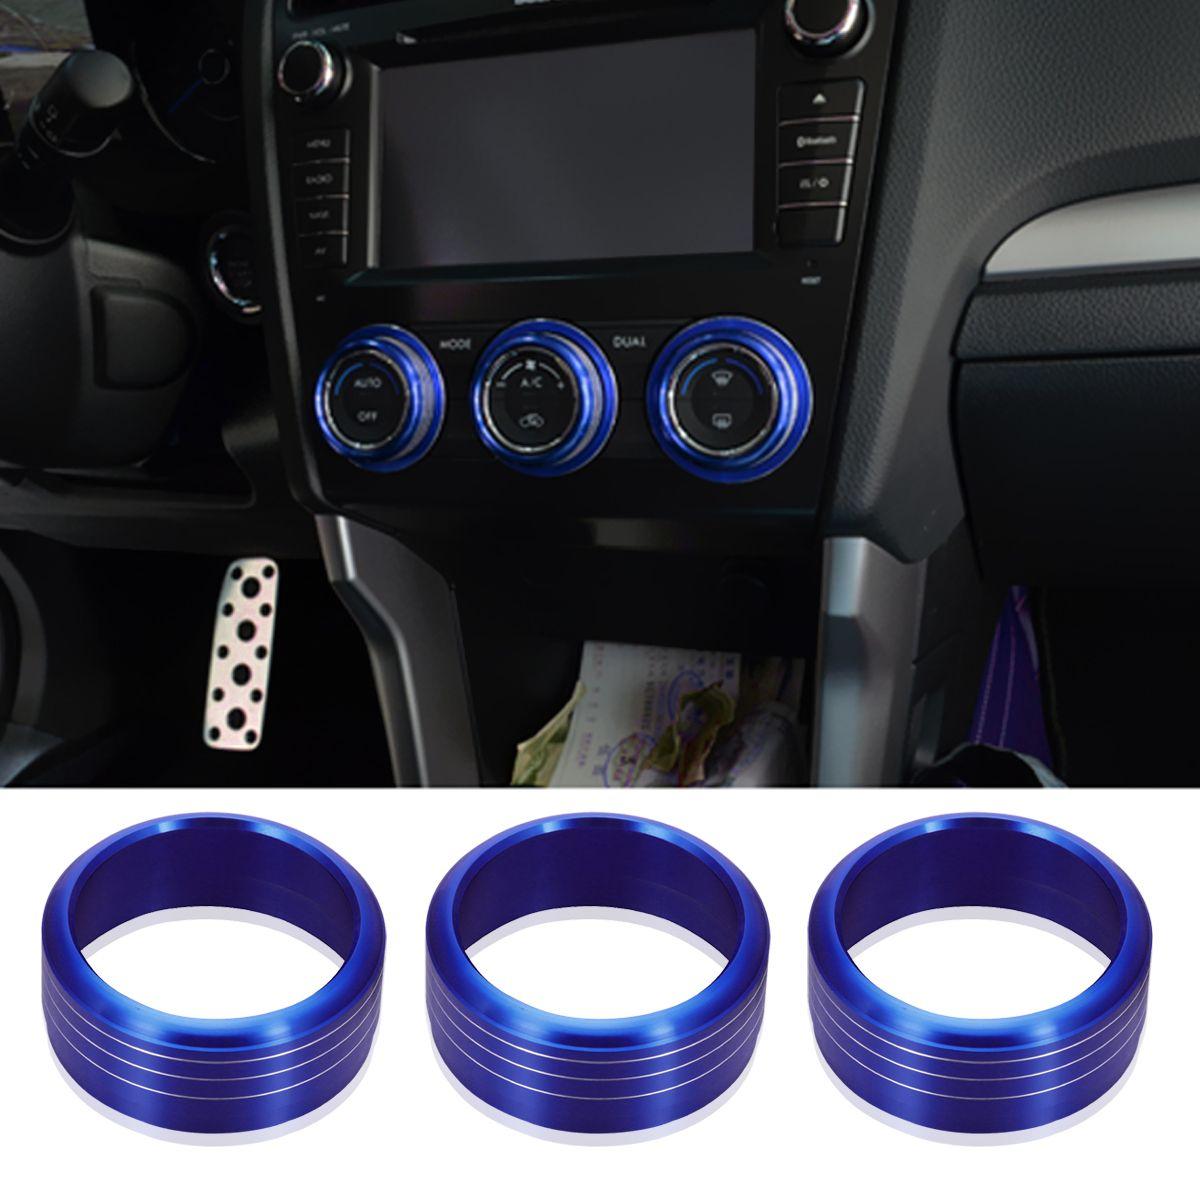 3pcs AC Climate Control Knob Ring Covers Protector Stickers For Subaru WRX STI Impreza Forester XV Car Decoration Accessories